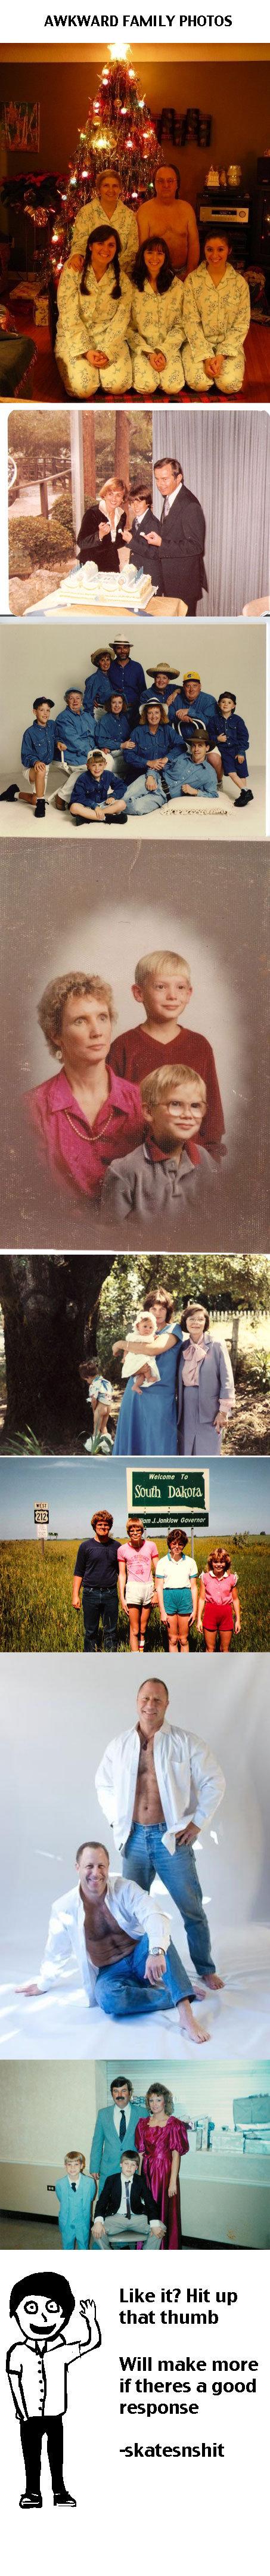 Awkward Family Photos. Plenty of Awkward to go around. AWKWARD FAMILY PHOTOS Like it? Hit up that thumb Will make more if theres at good response. how terrifying awkward family photos